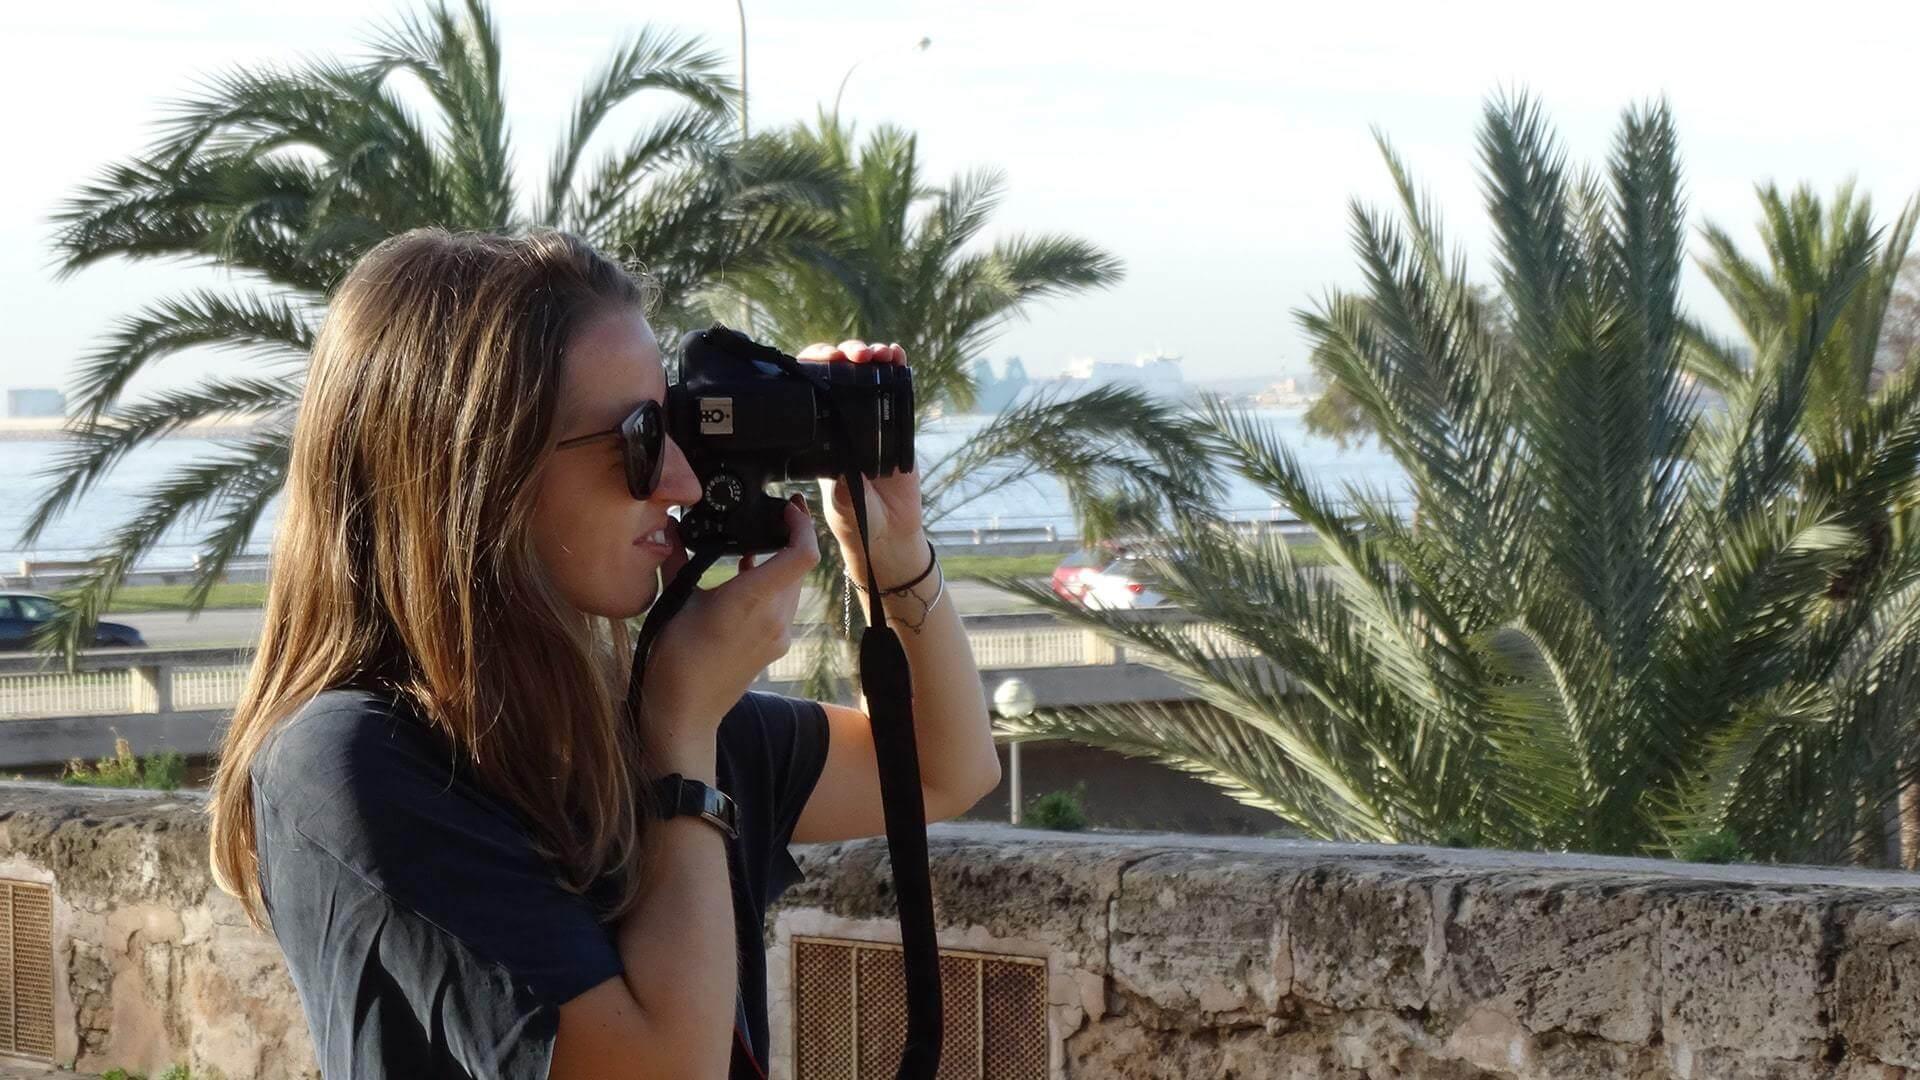 Adele Chretien photographer Palma min